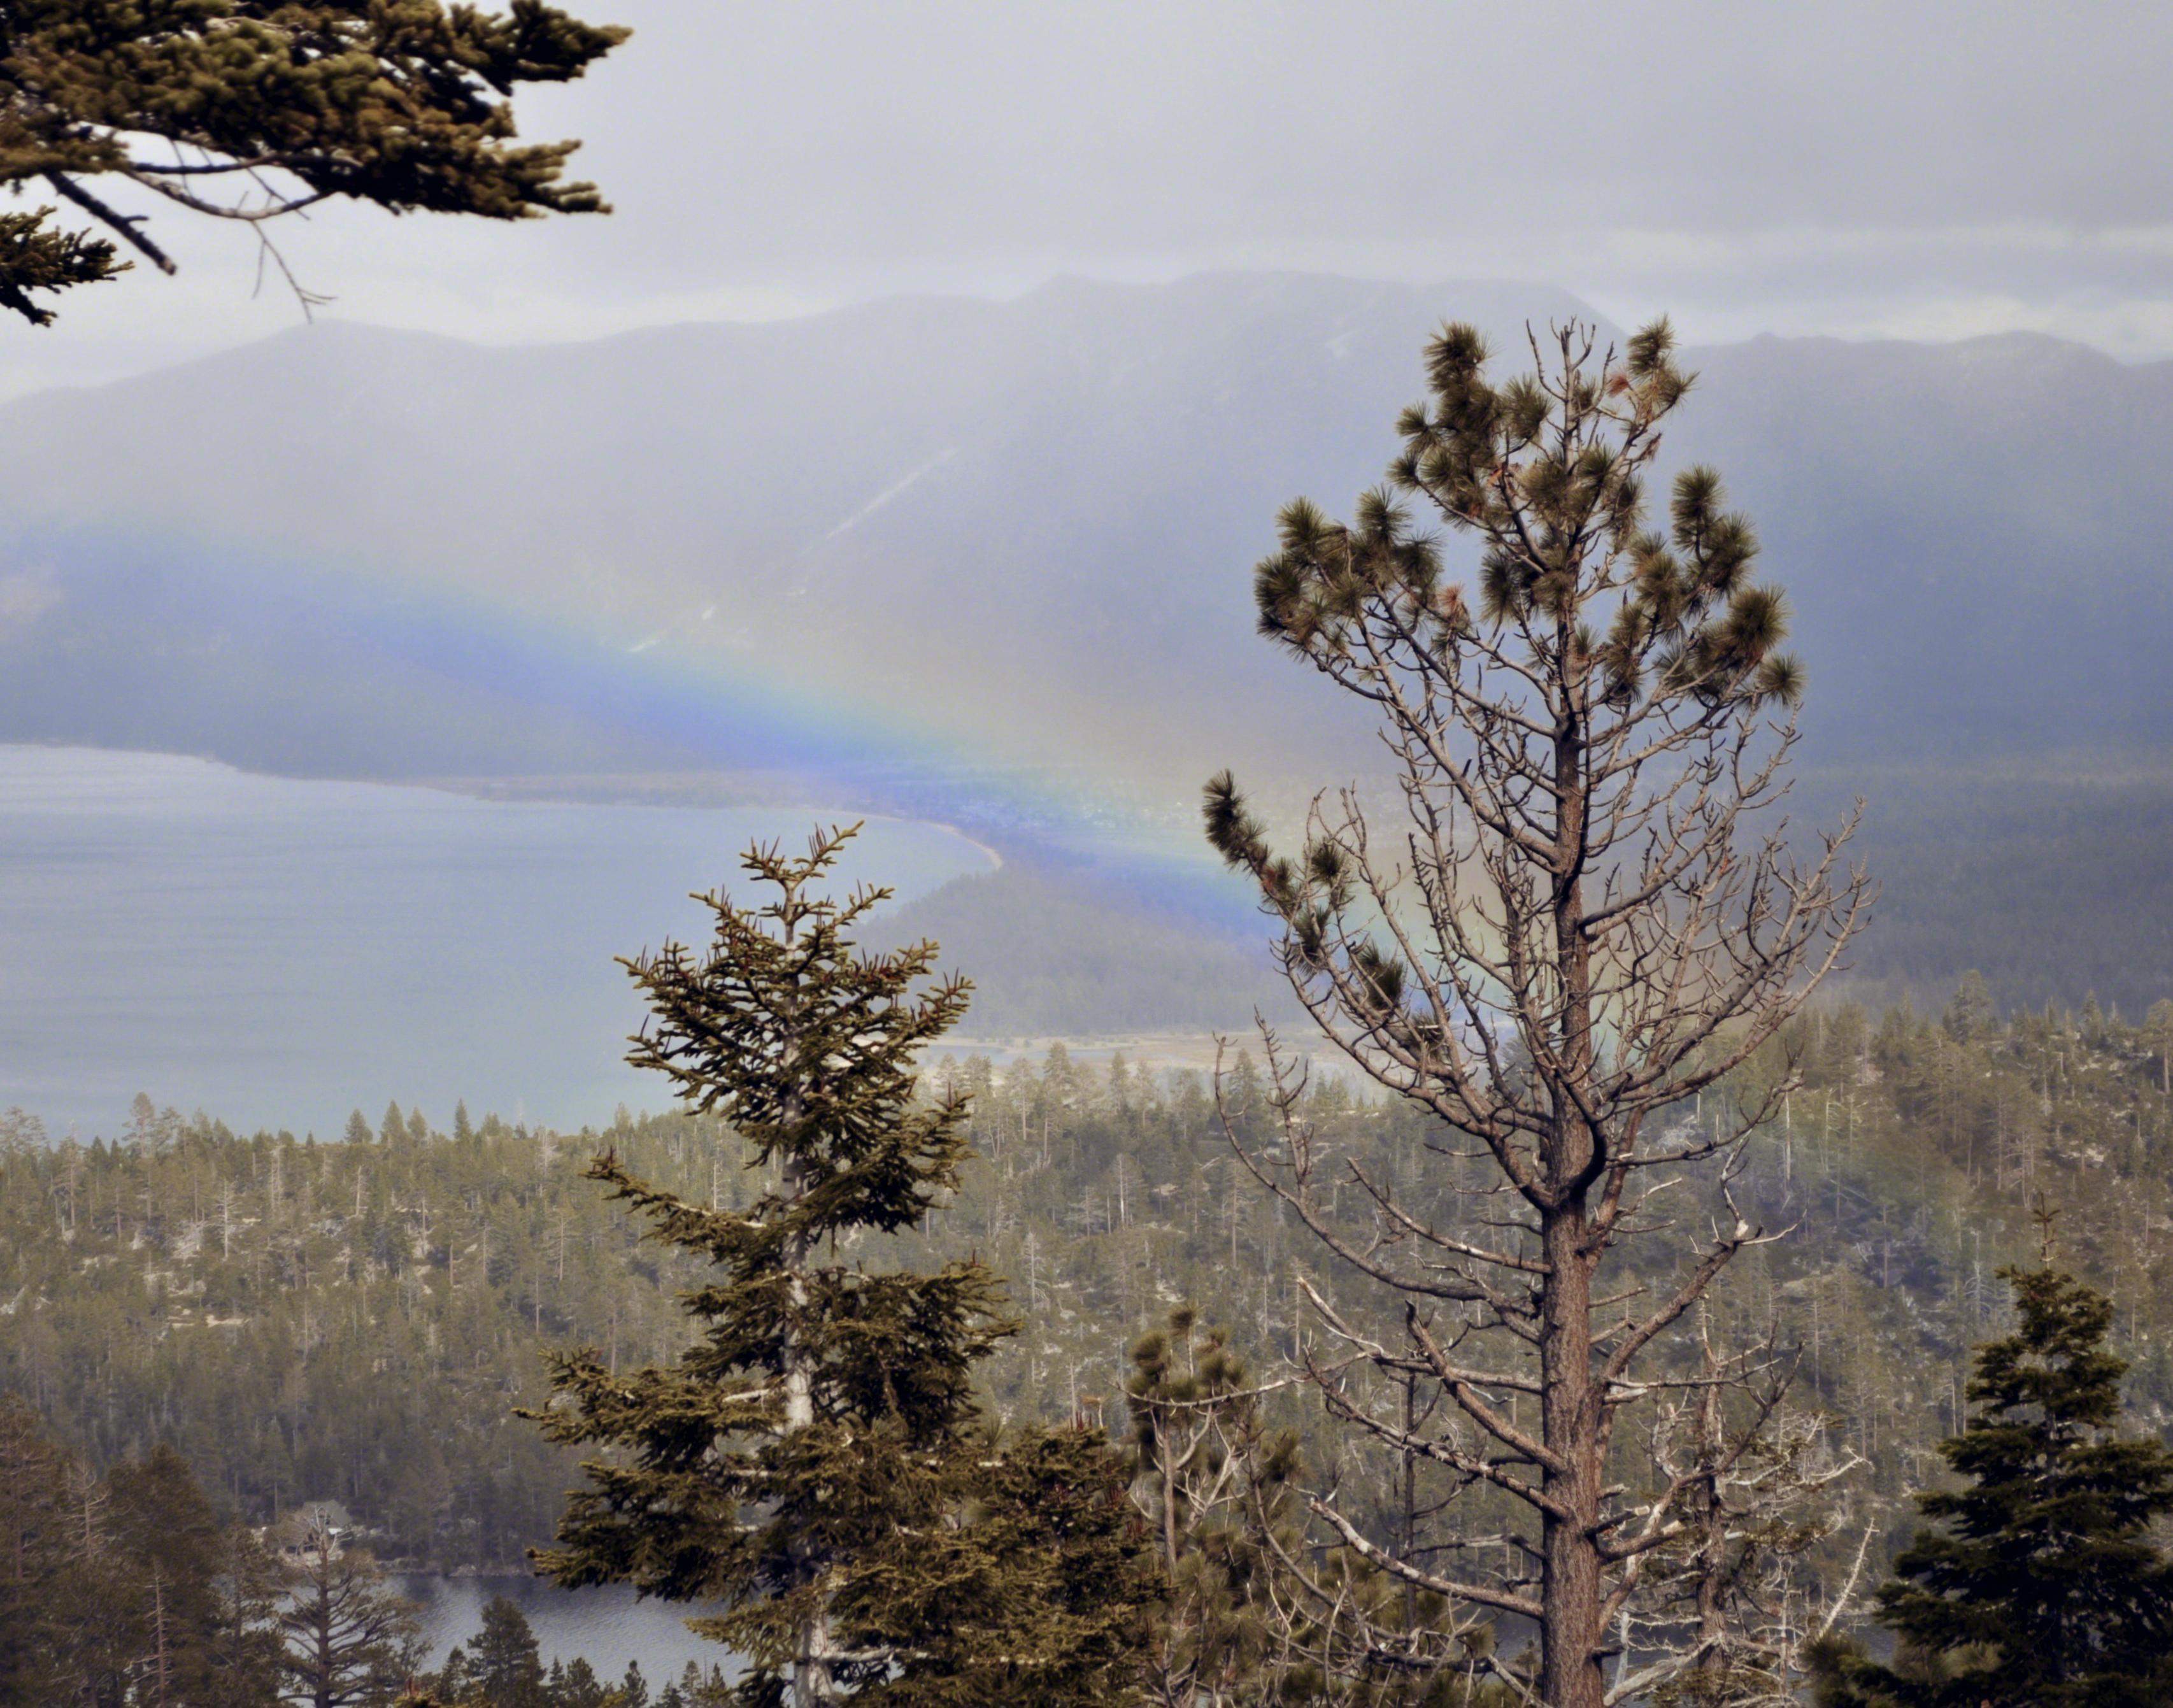 Location: Lake Tahoe, CA Photographer: Steven Williams www.isstevestillalive.com www.facebook.com/isstevestillalive www.twitter.com/stevestillalive